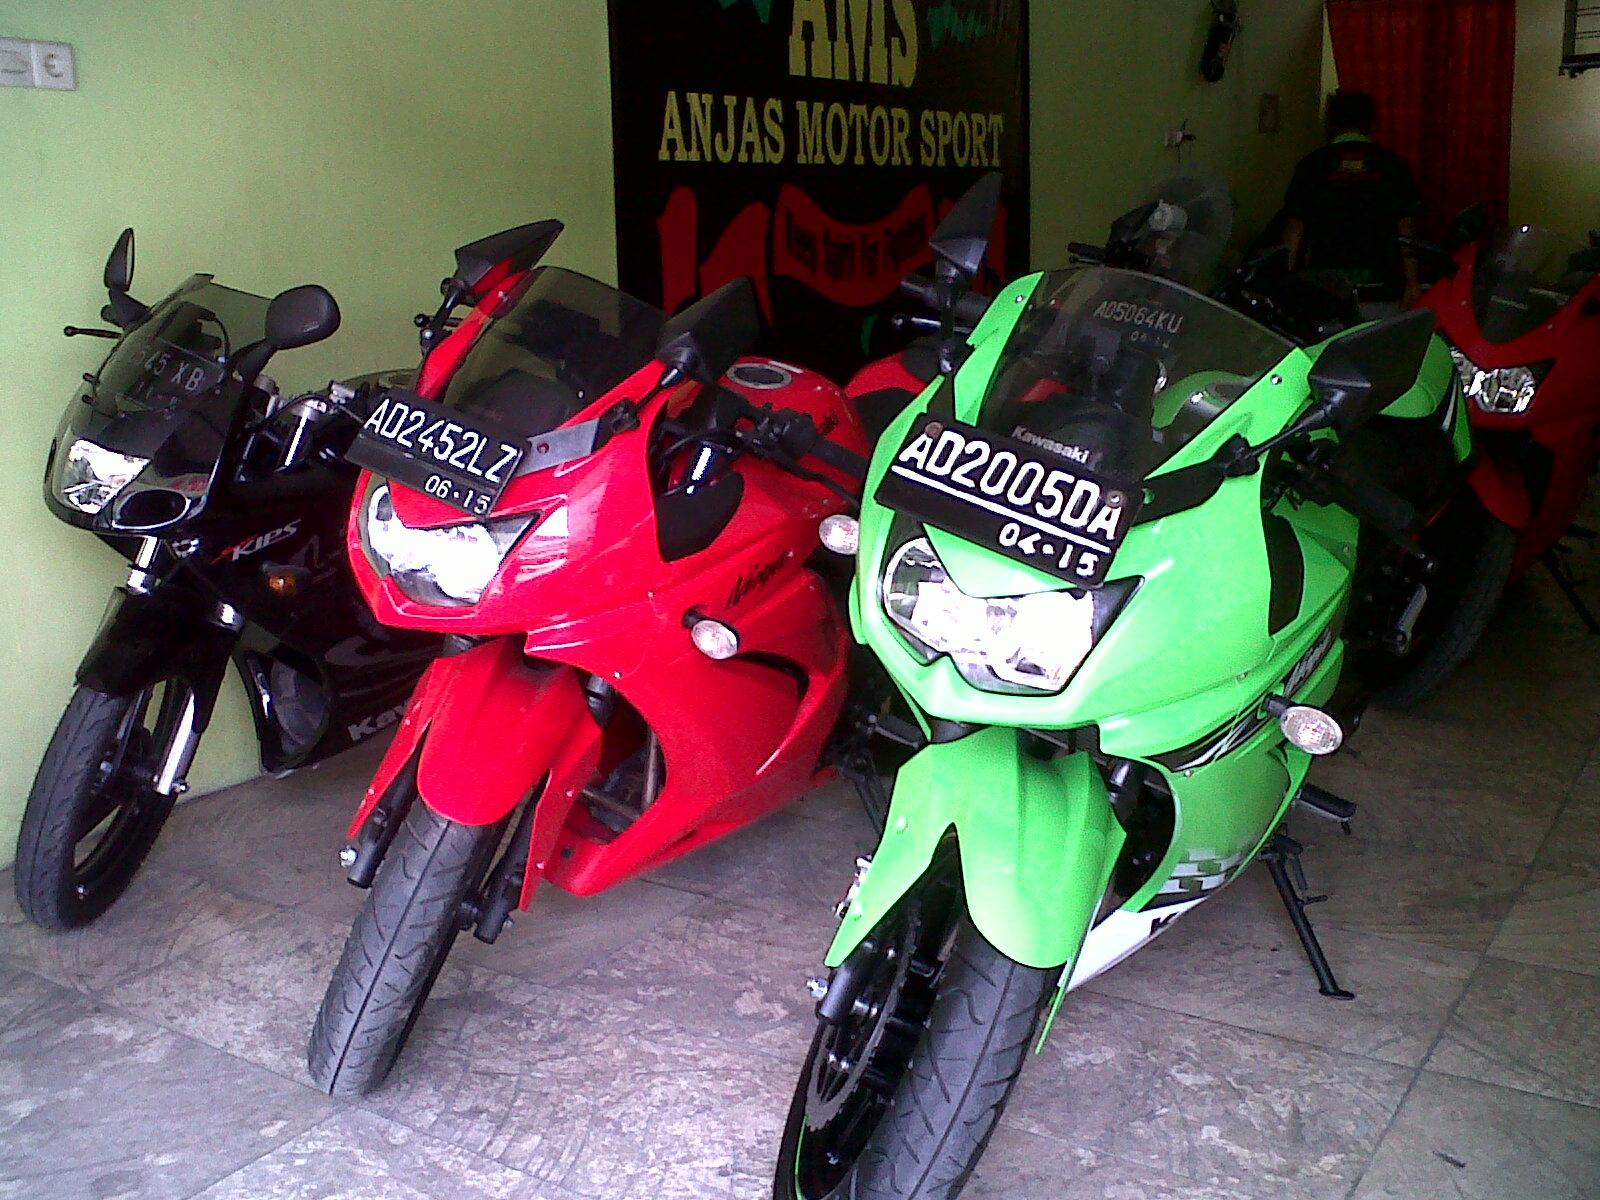 Anjas Motor Sport